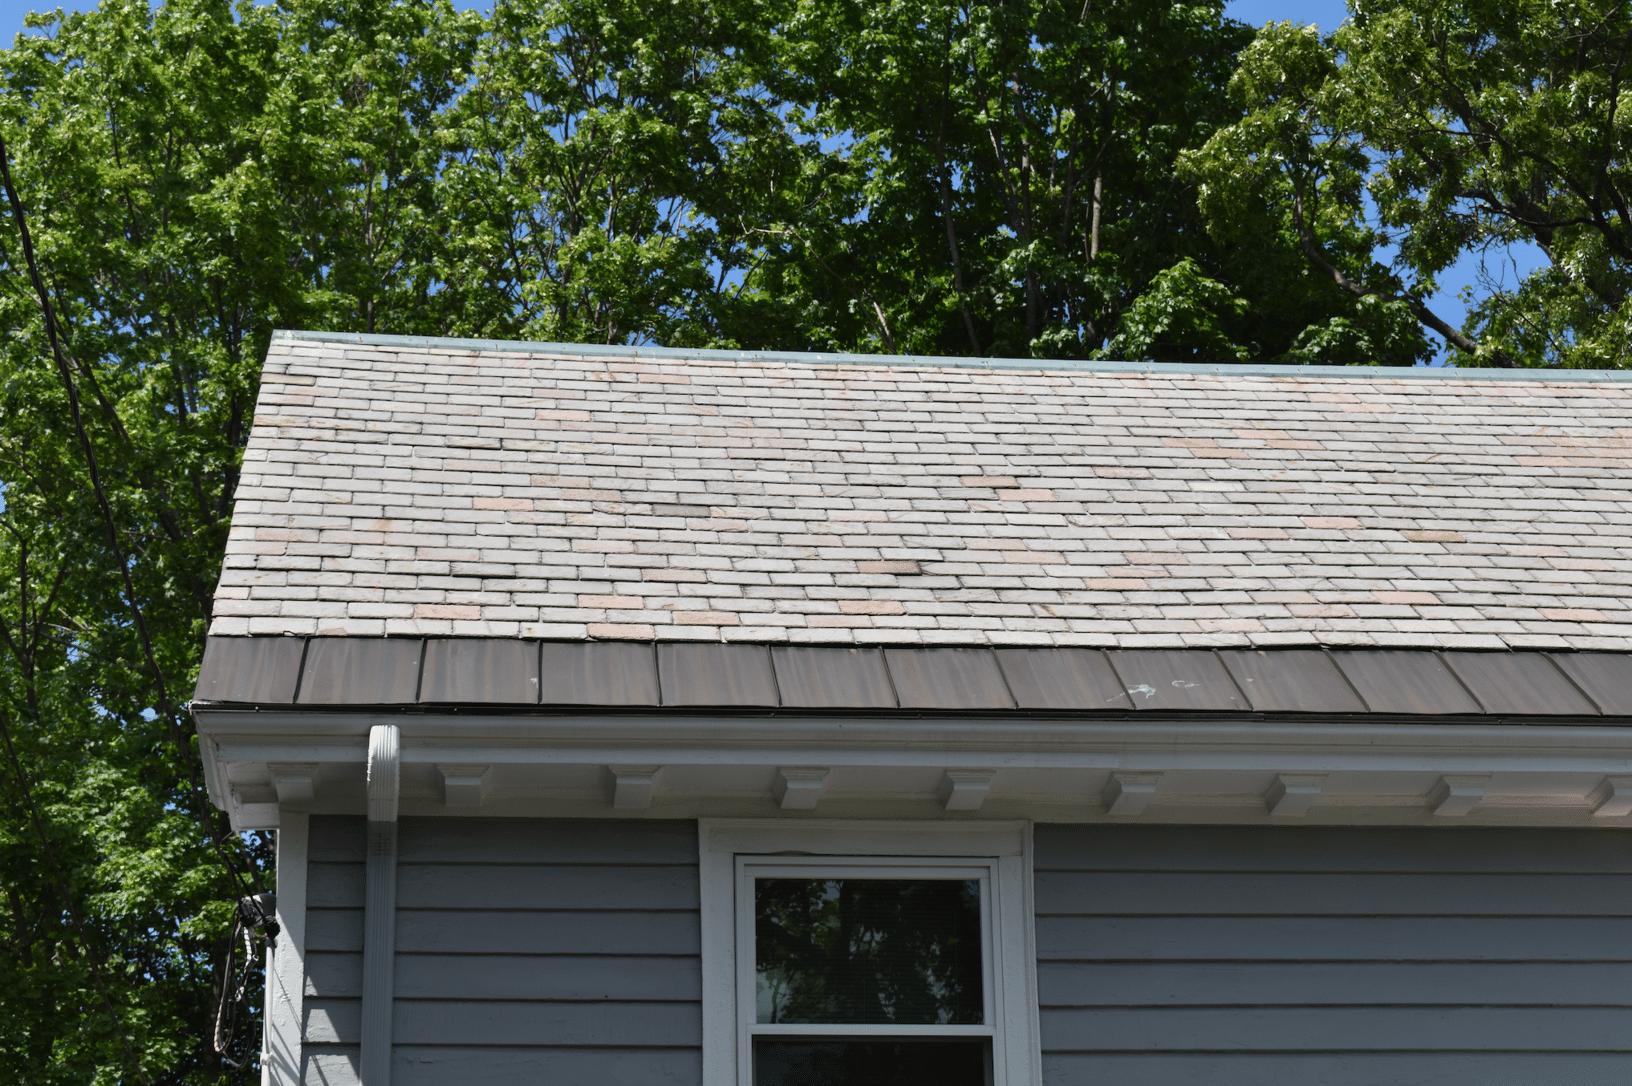 Copper Panels